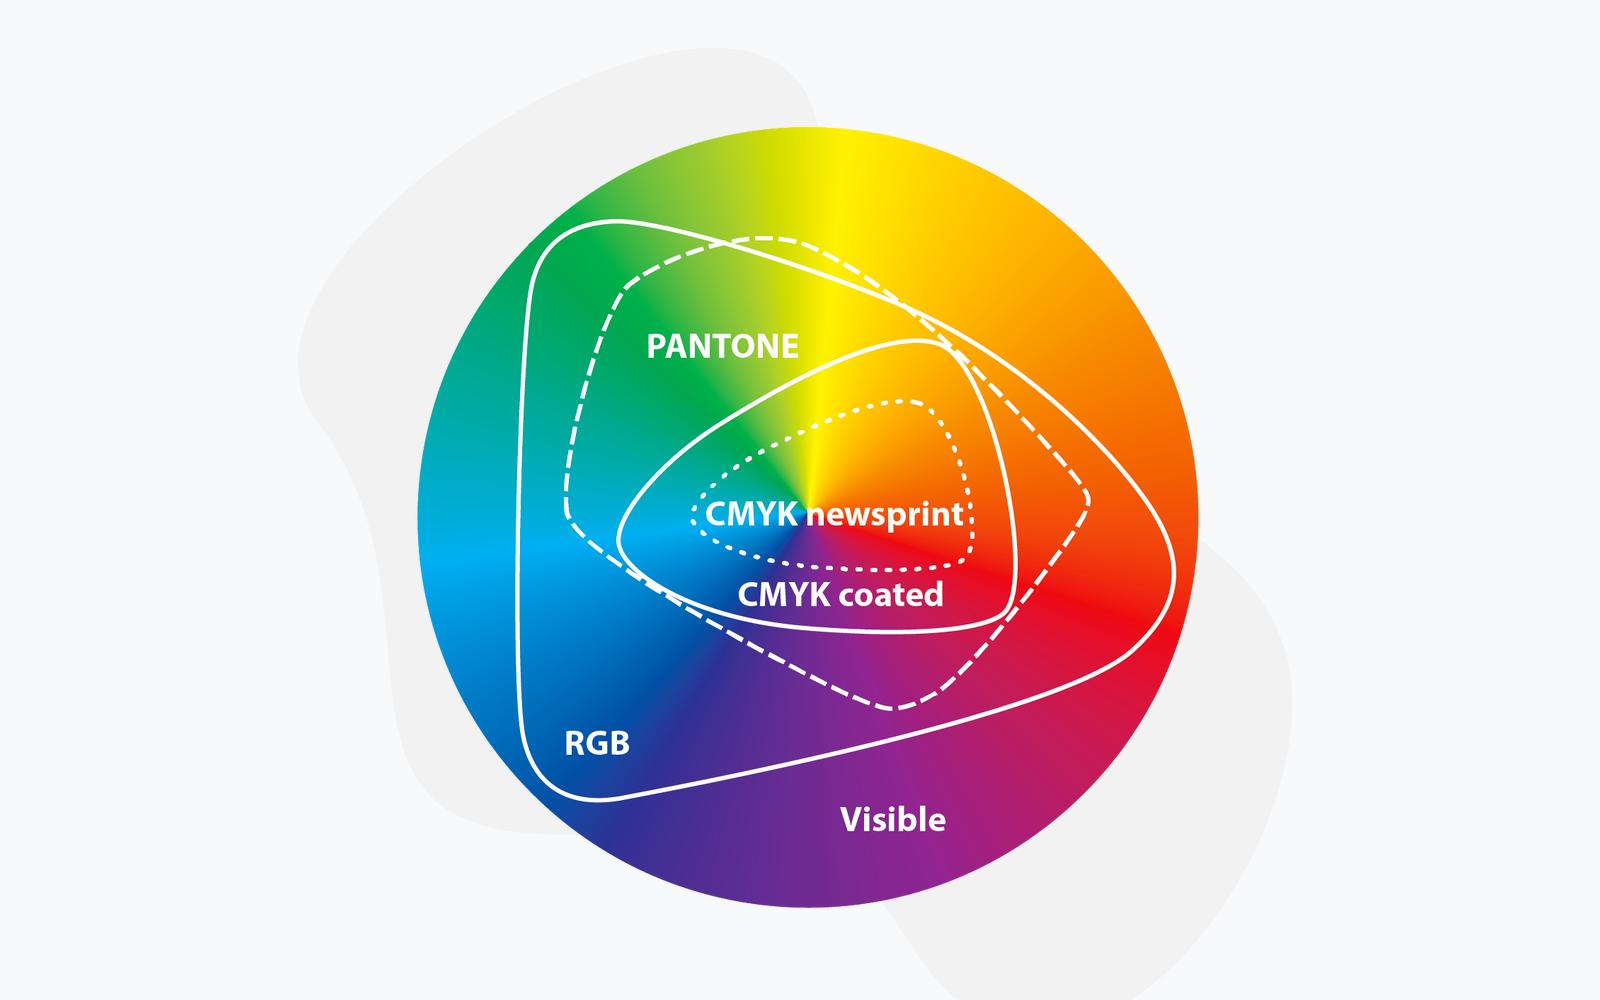 CMYK RGB Pantone colorspace